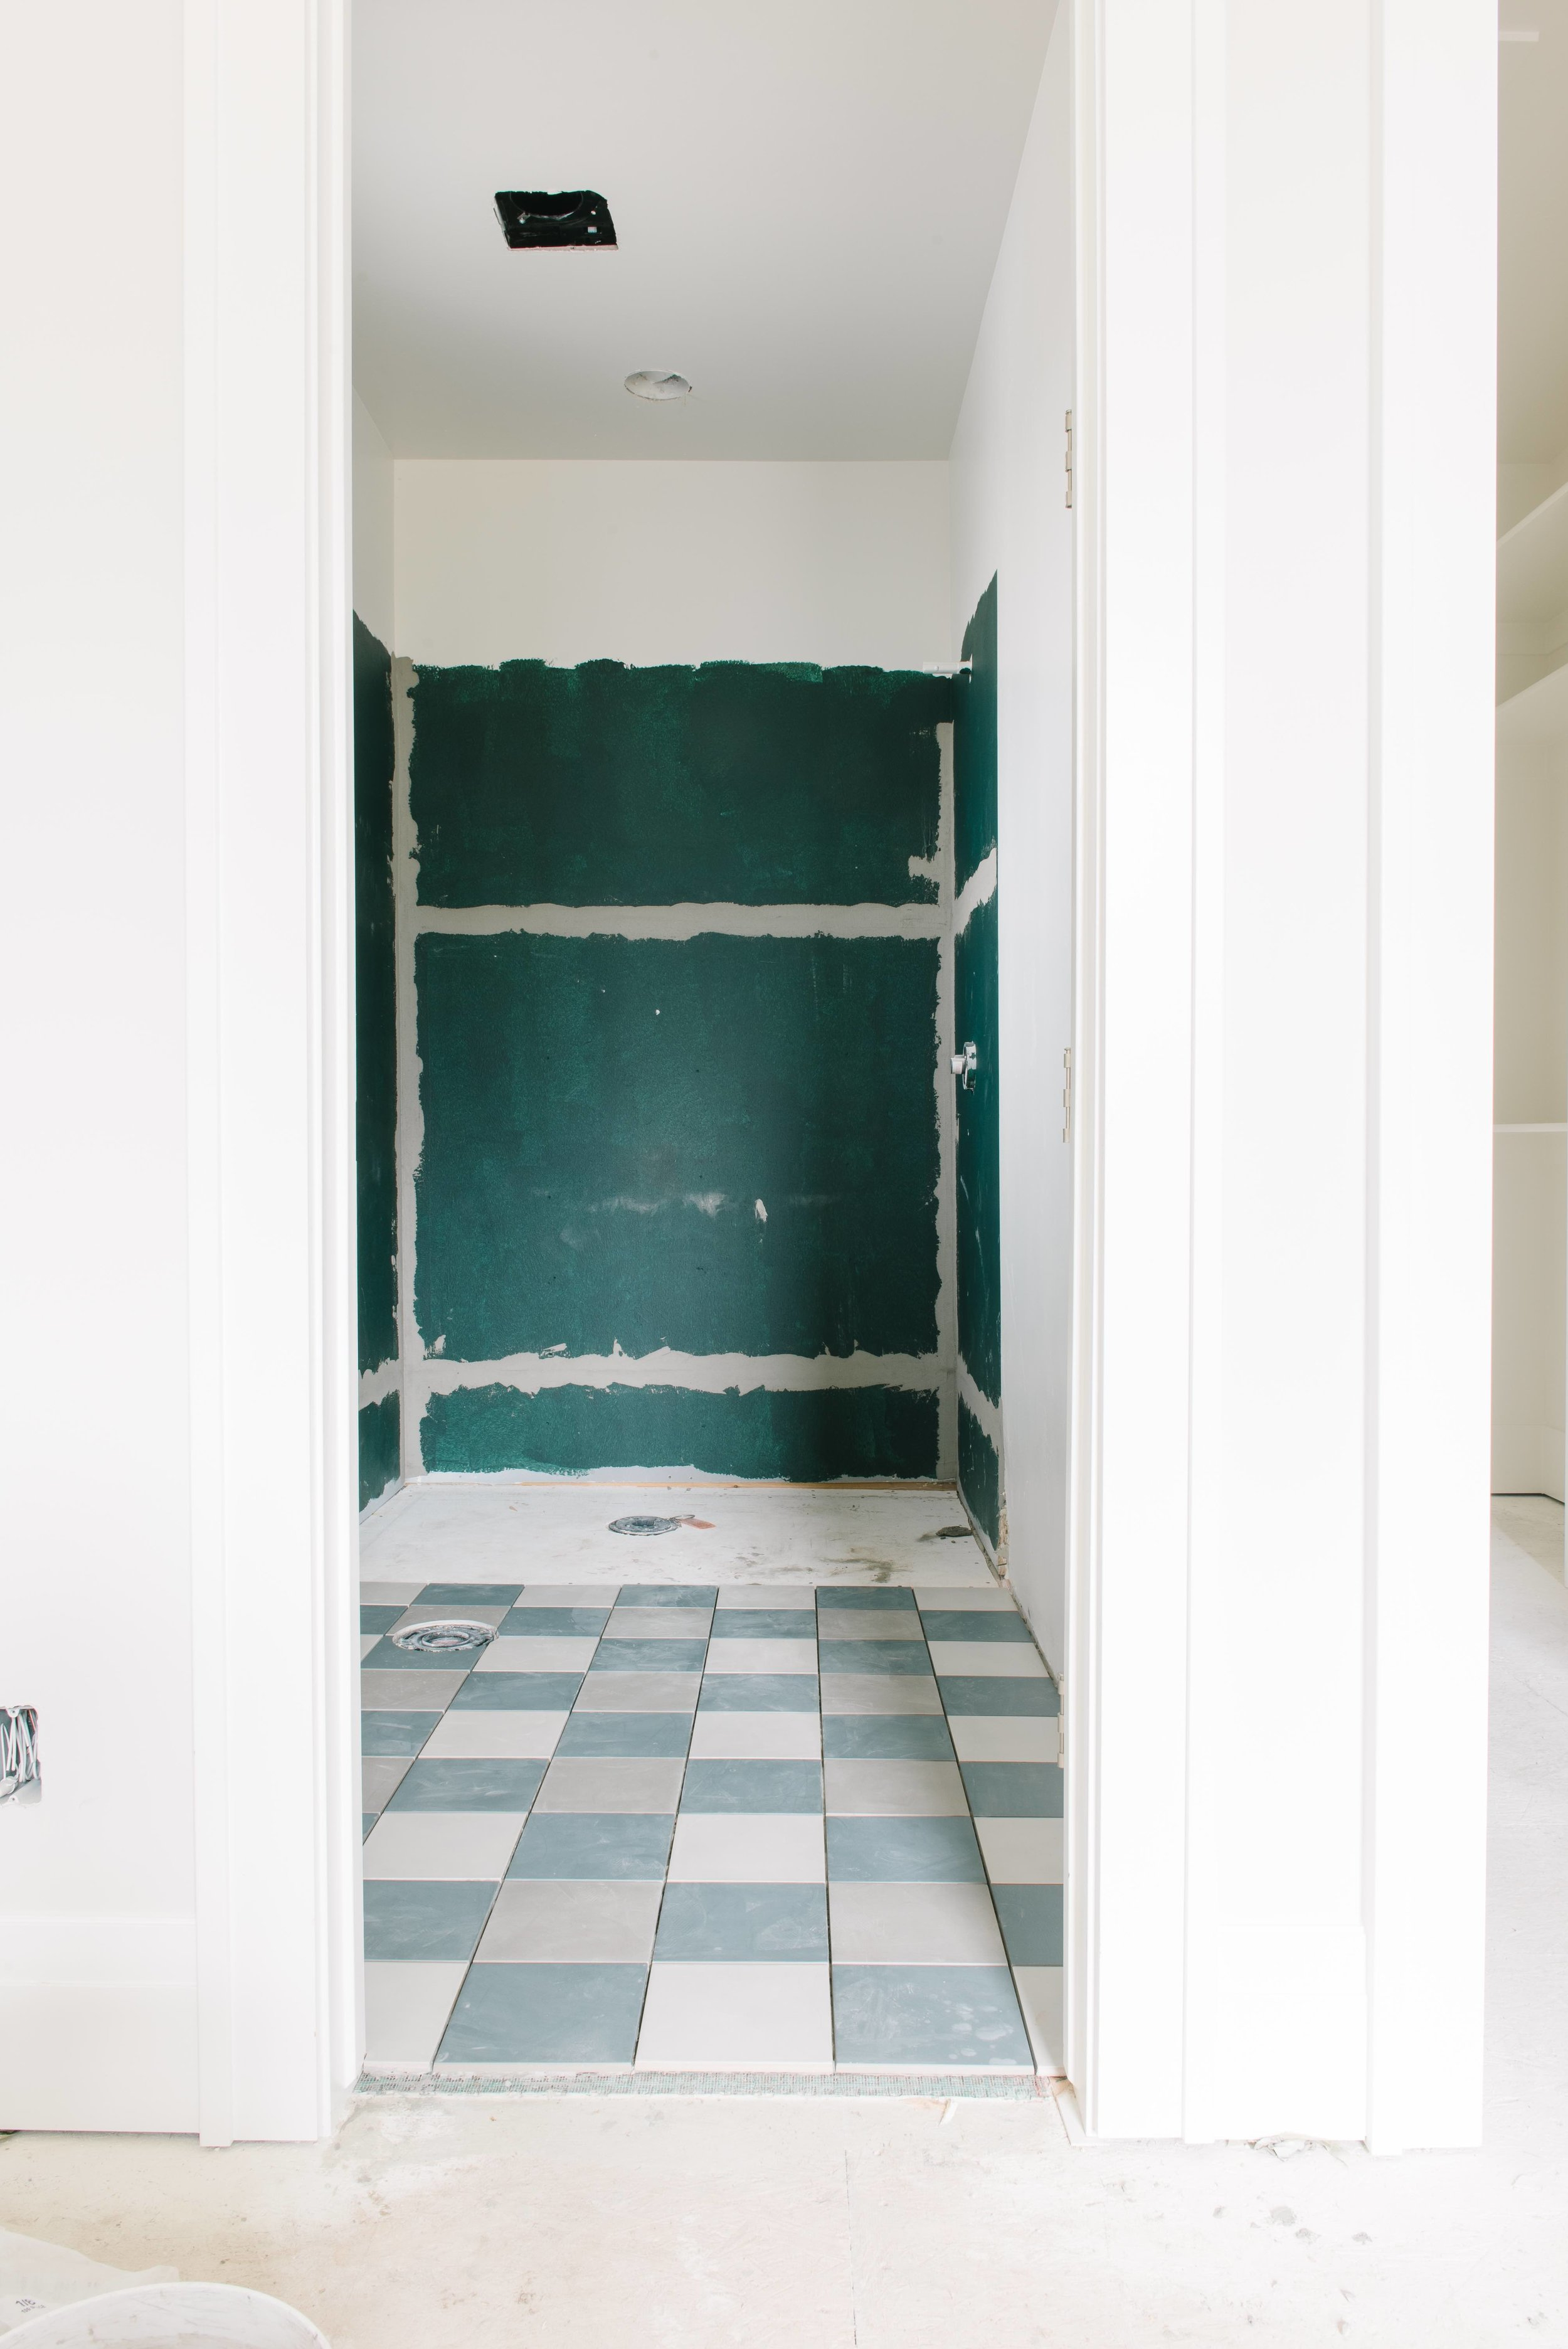 BUFFALO-CHECKED BATHROOM FLOOR